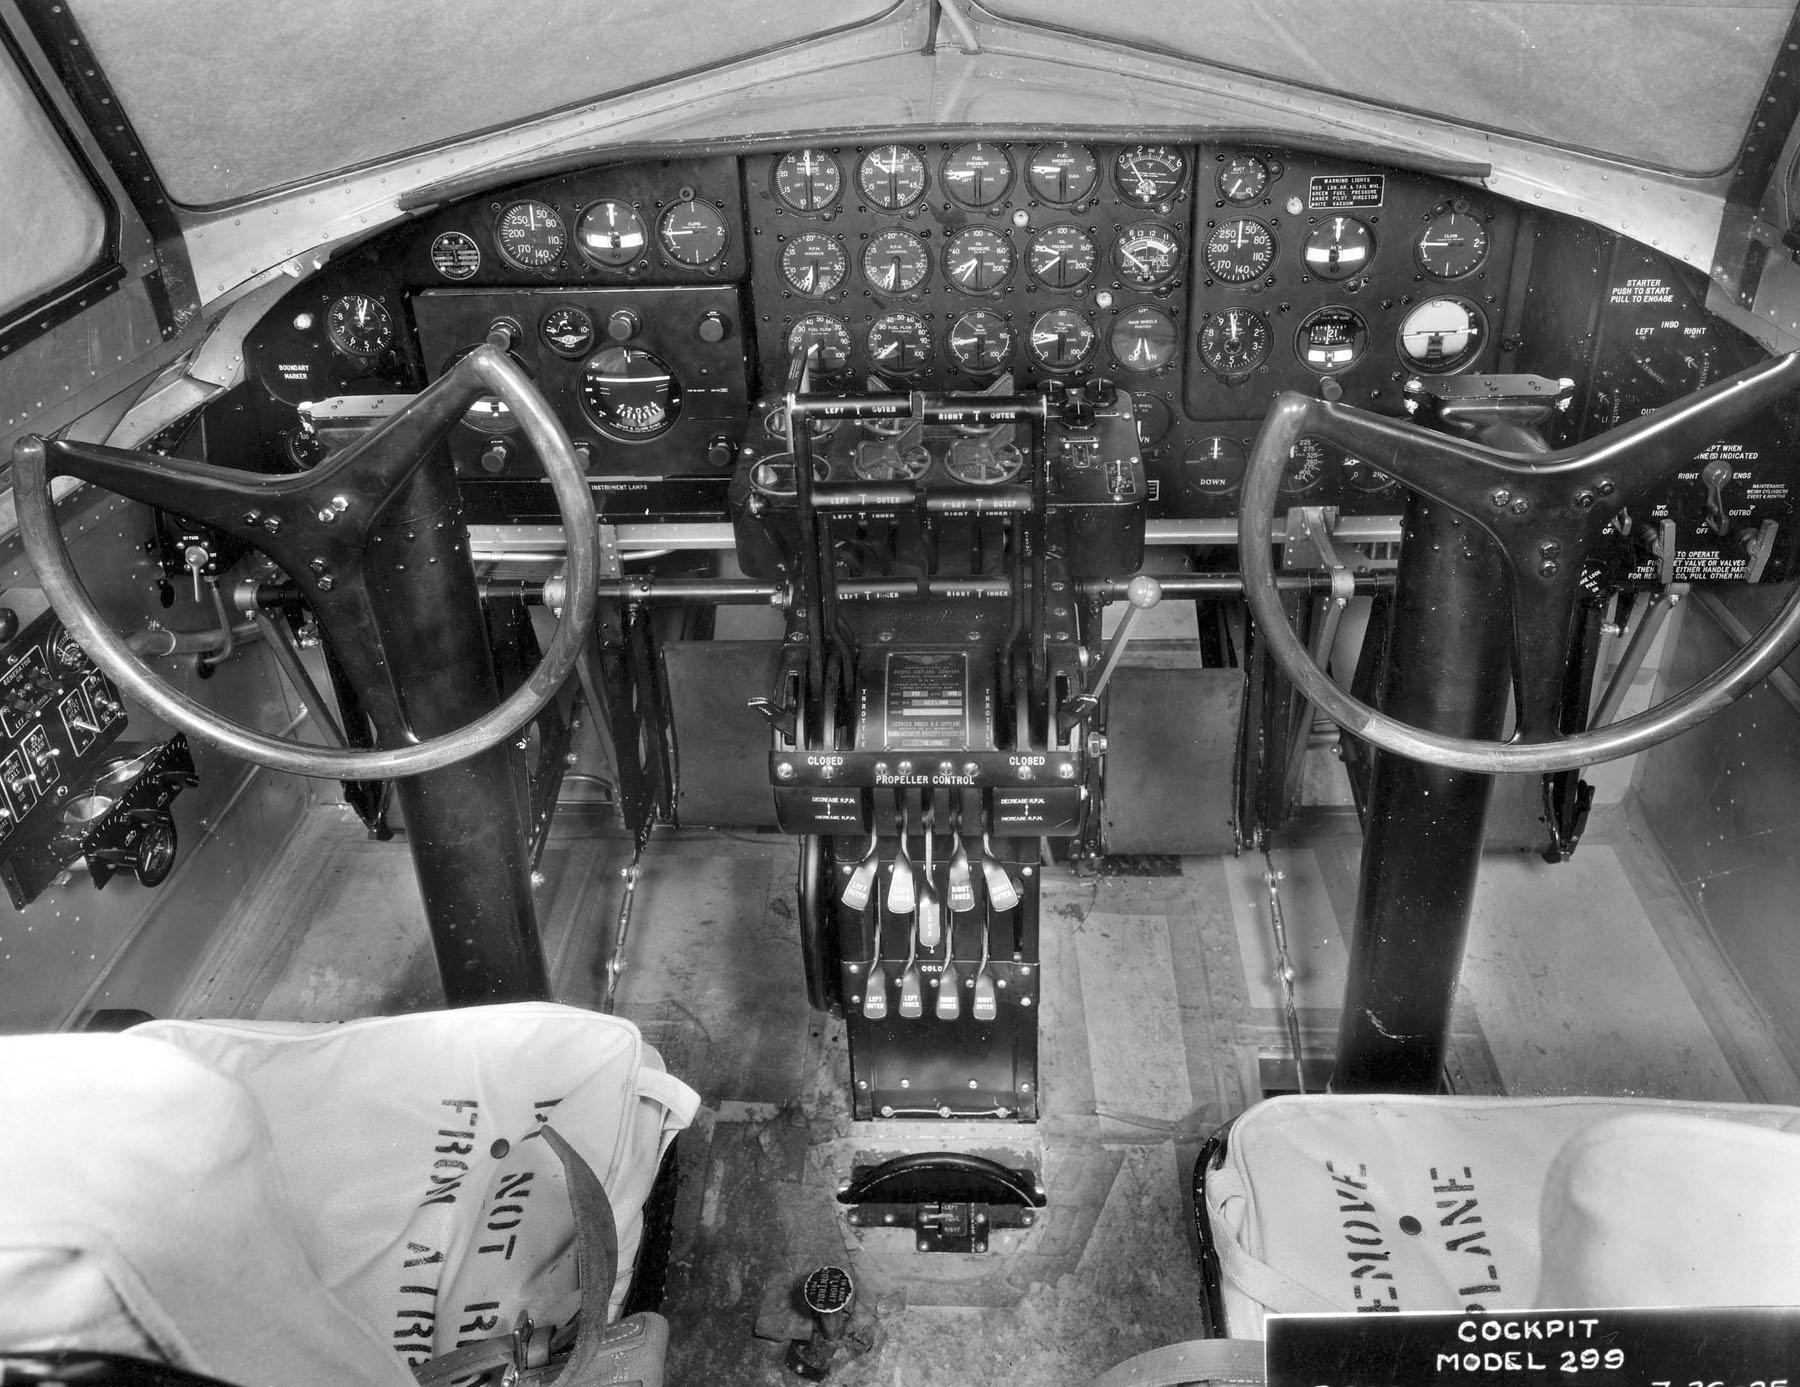 File:Boeing Model 299 cockpit b299-6.jpg